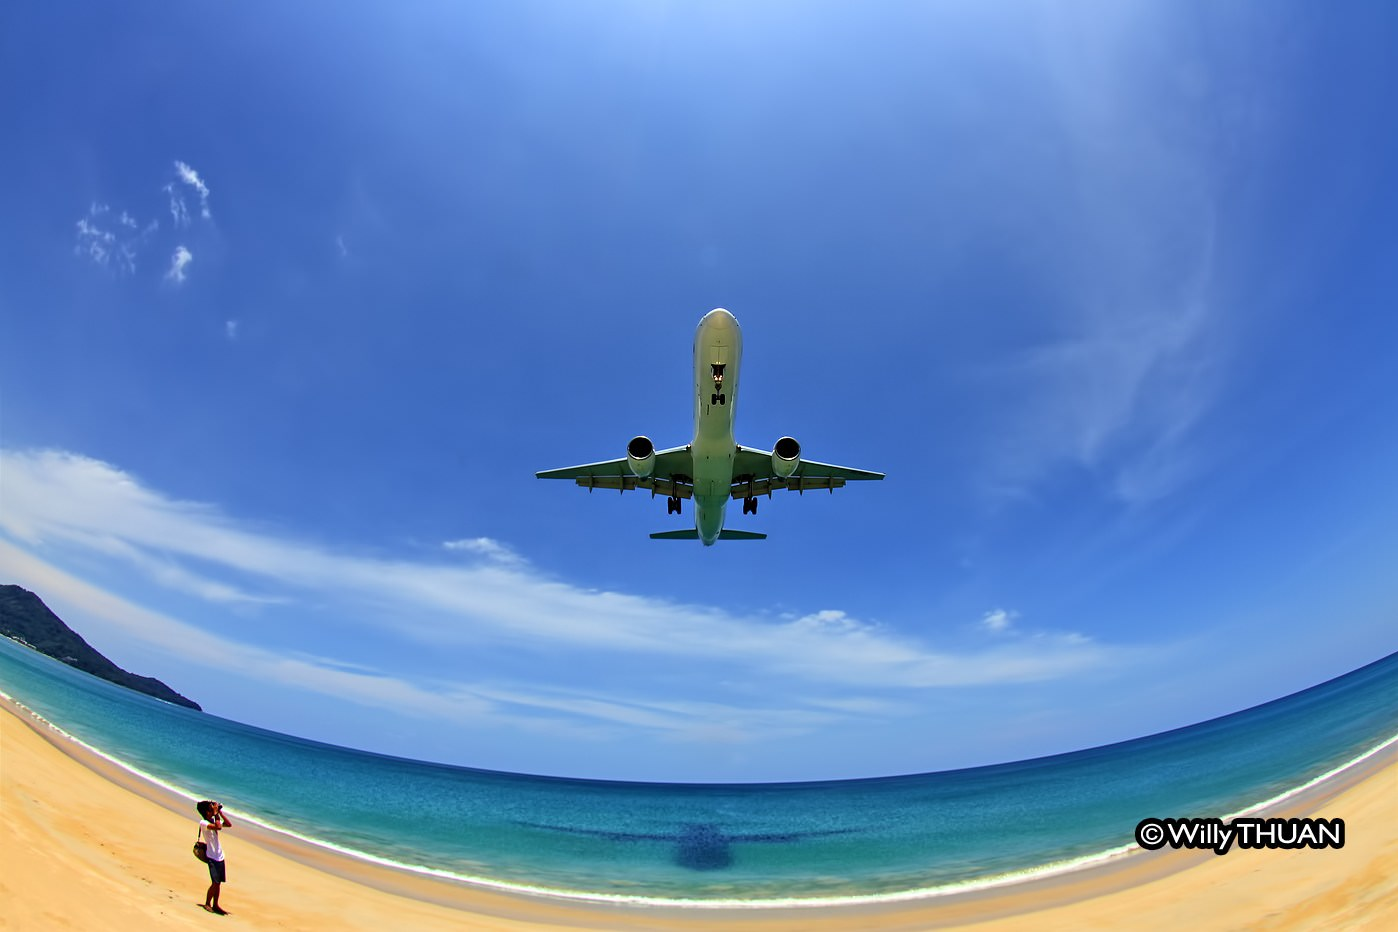 Where to See Planes Landing in Phuket? Plane Spotting in Phuket